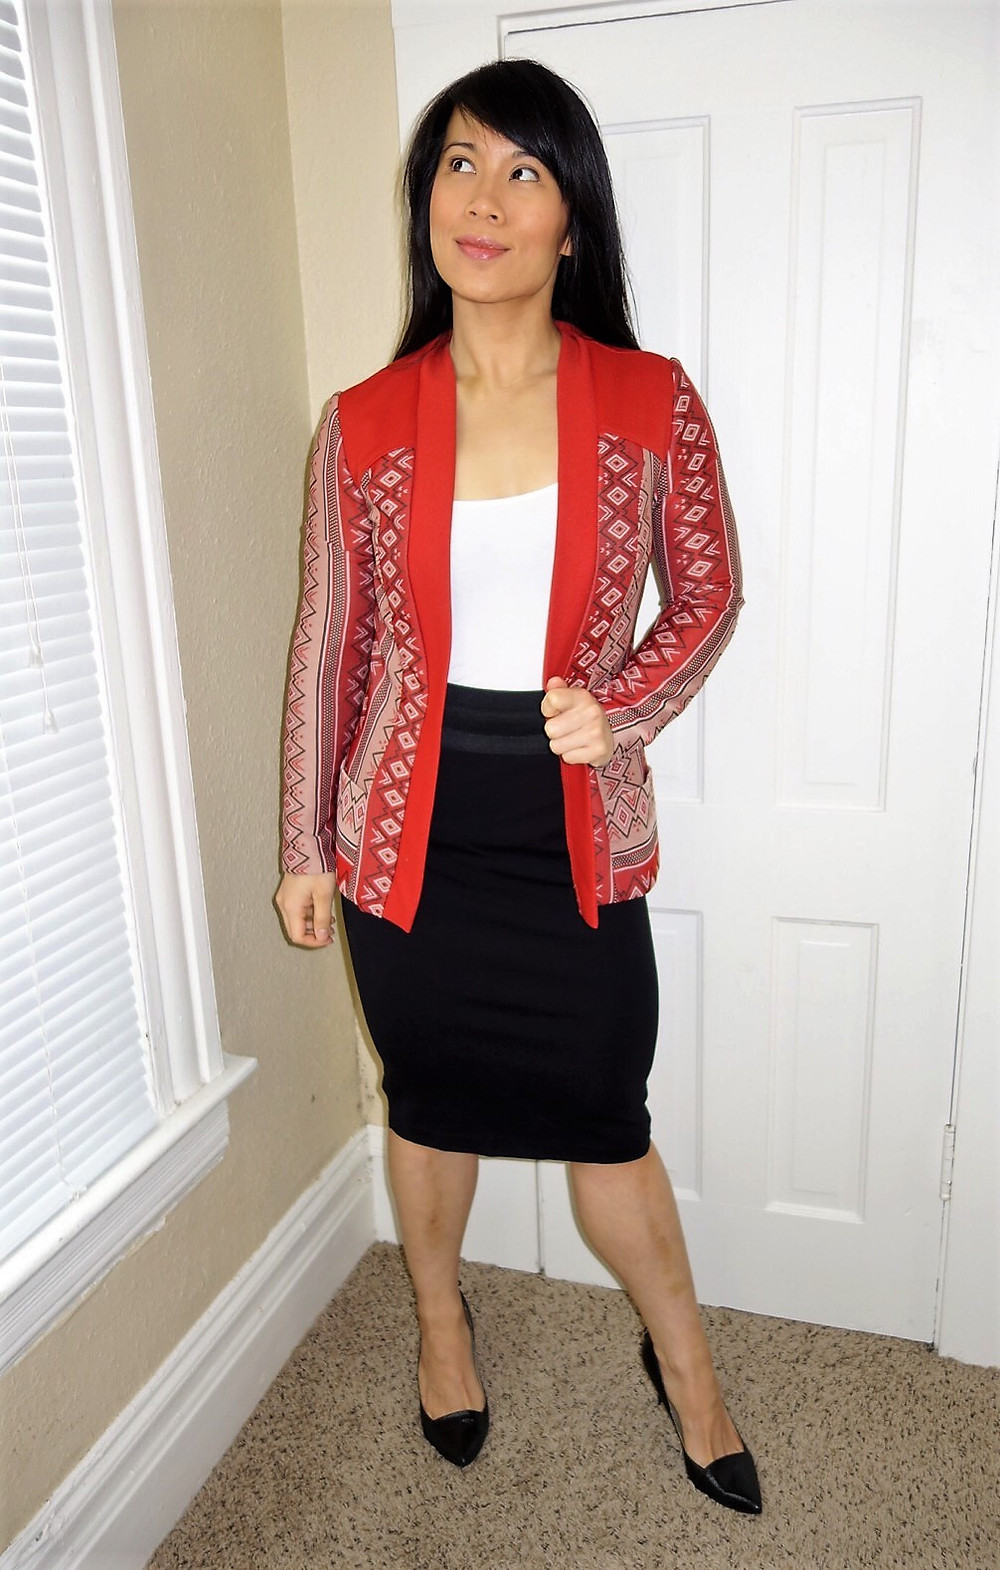 Kat Depner wearing tribal blazer and pencil skirt